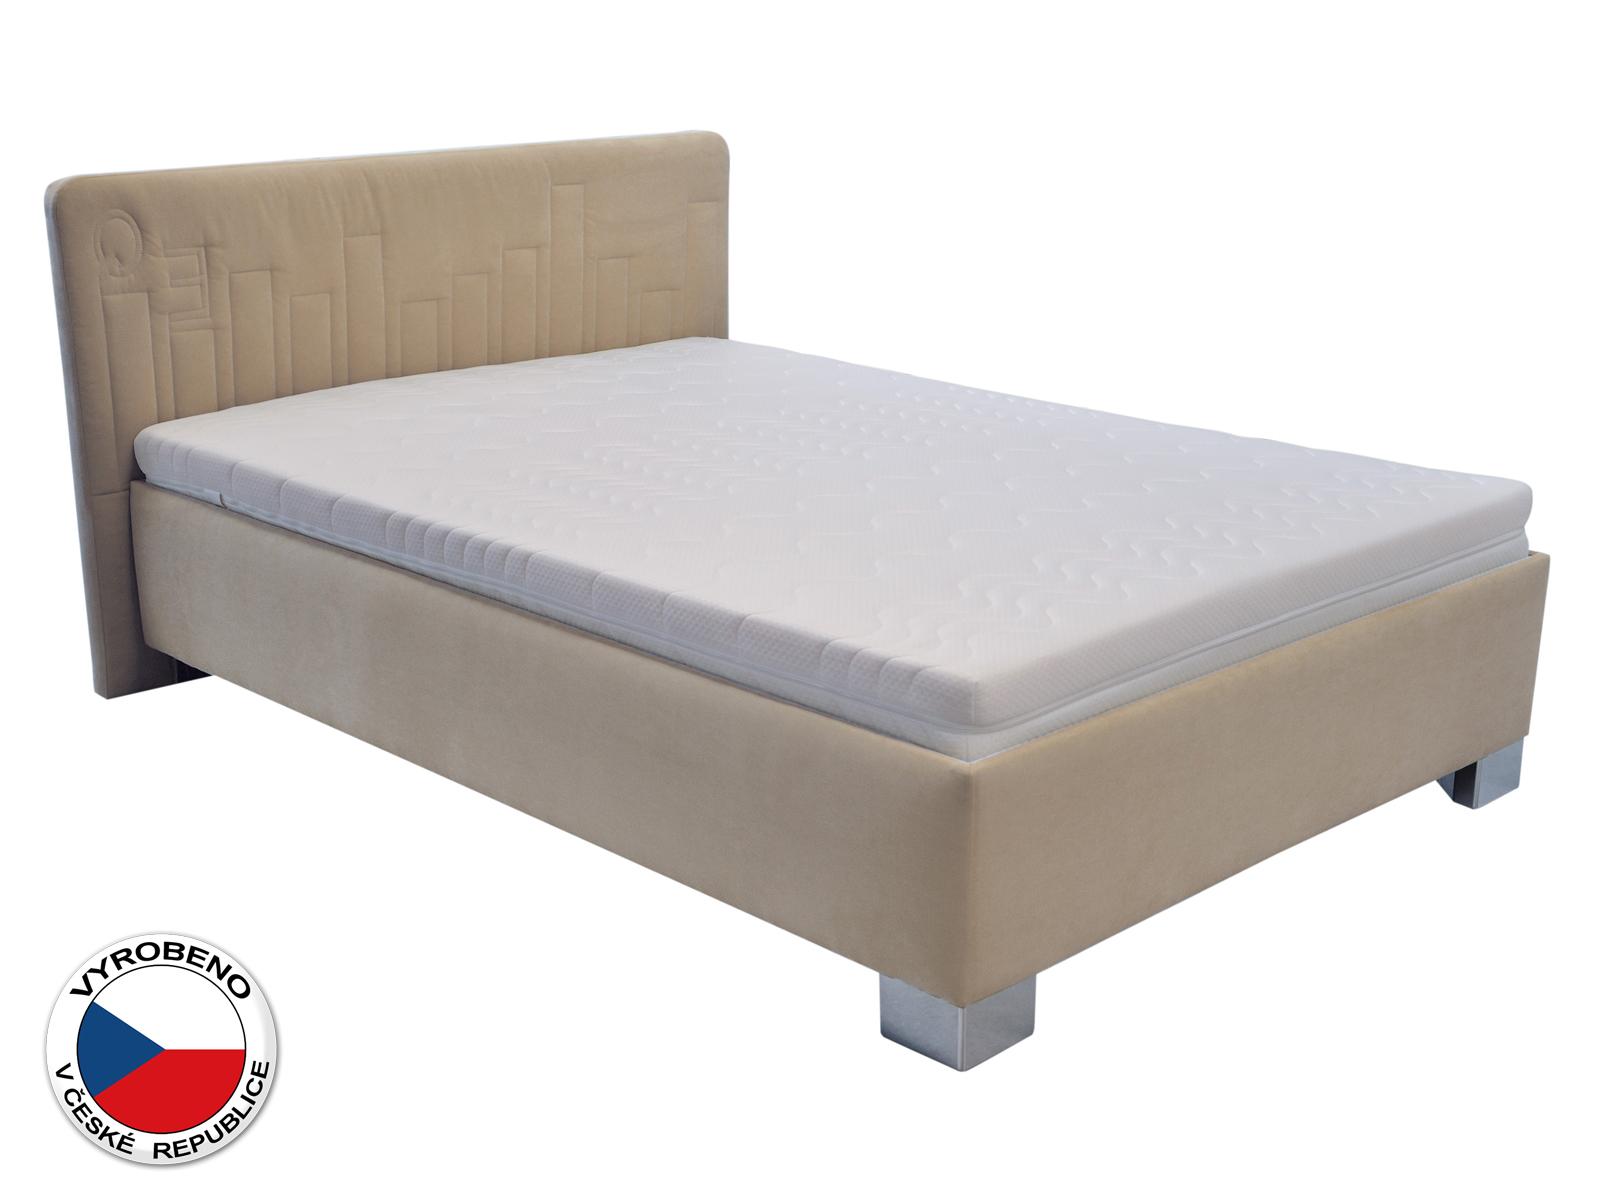 Jednolůžková postel 120 cm - Blanár - Dona (béžová) (s roštem)